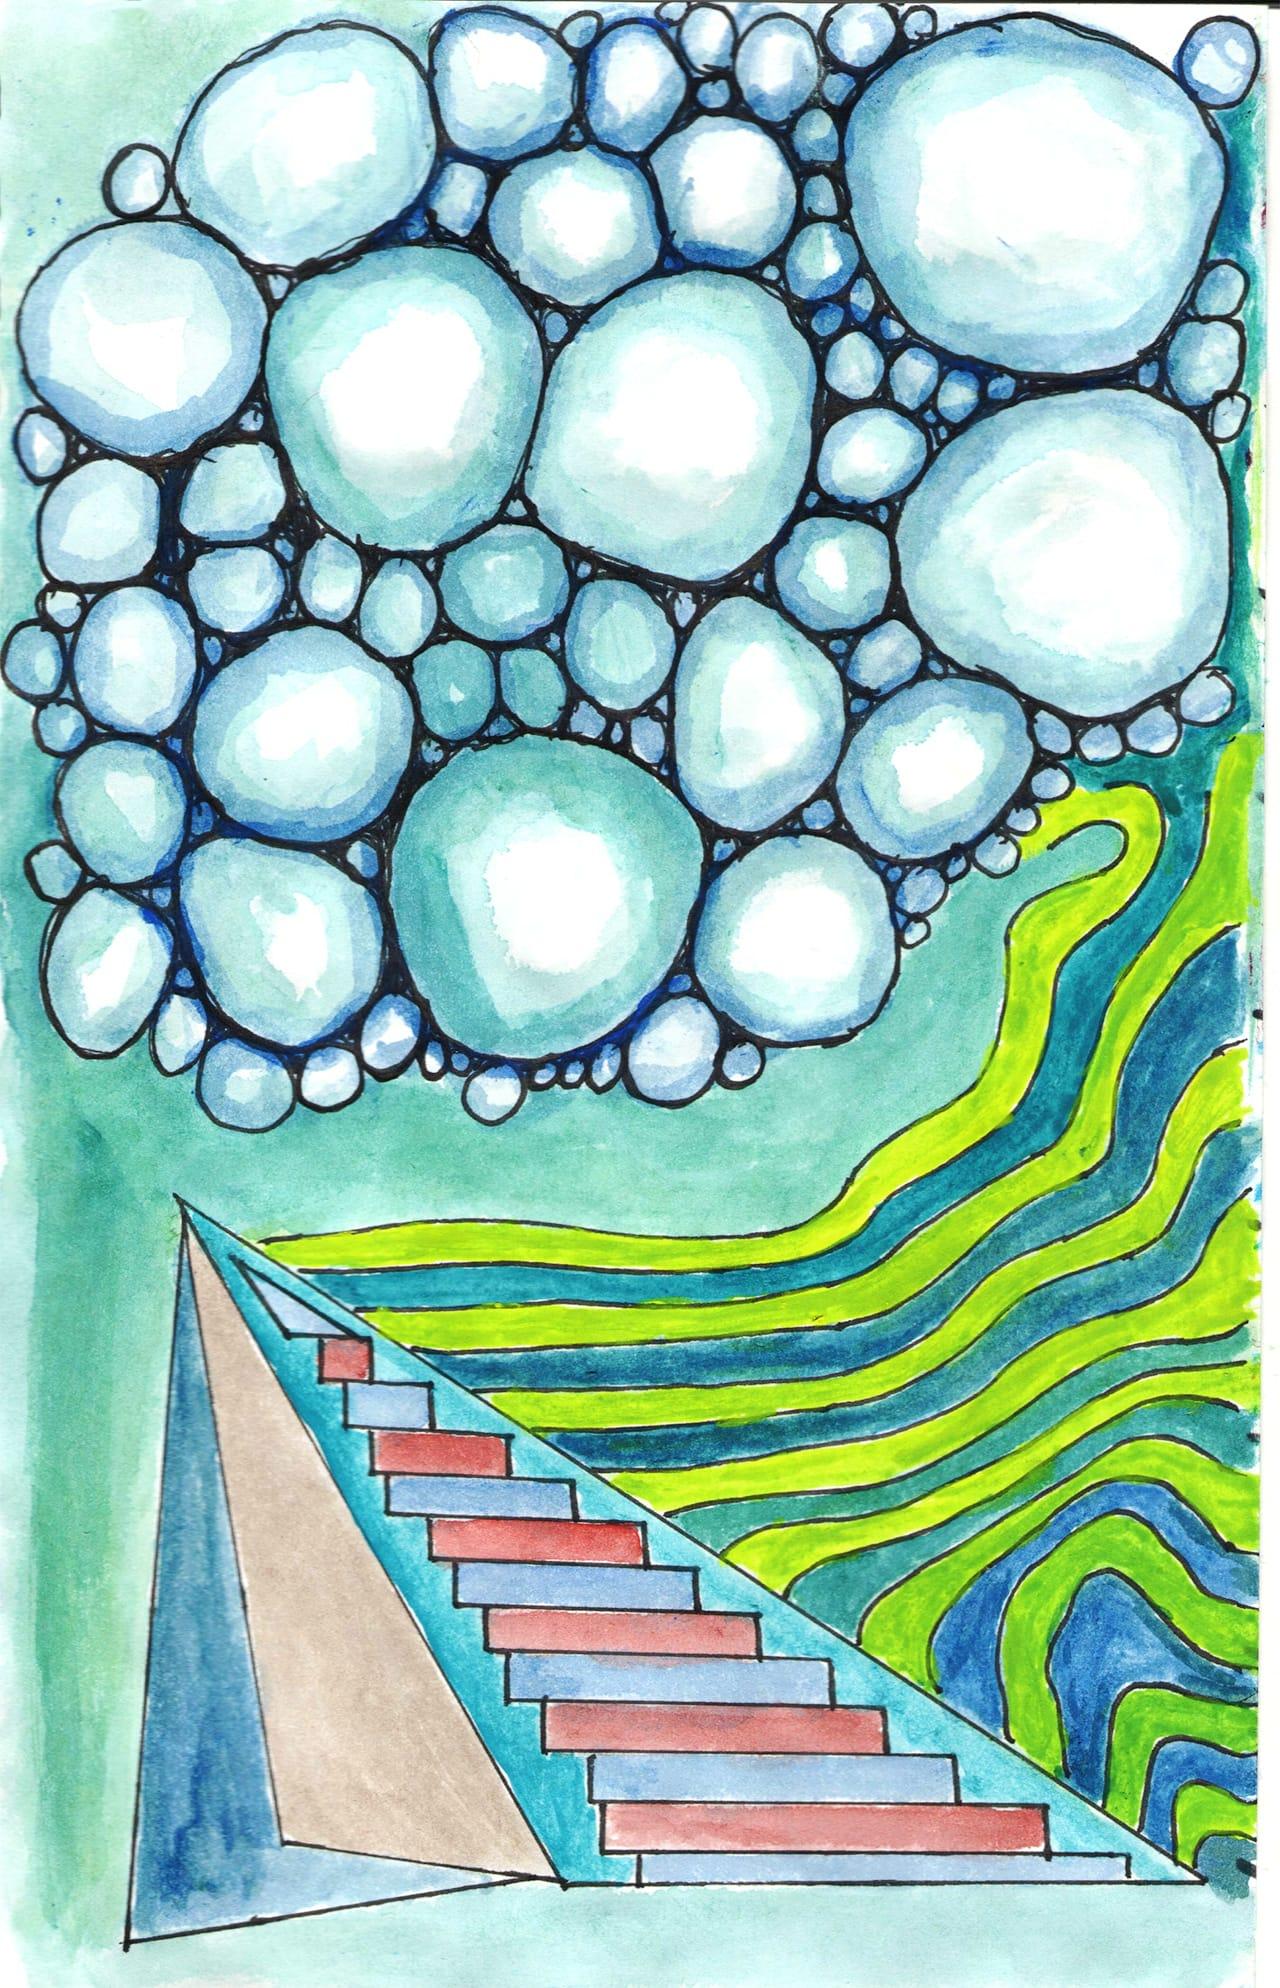 Dreams of Bubbles